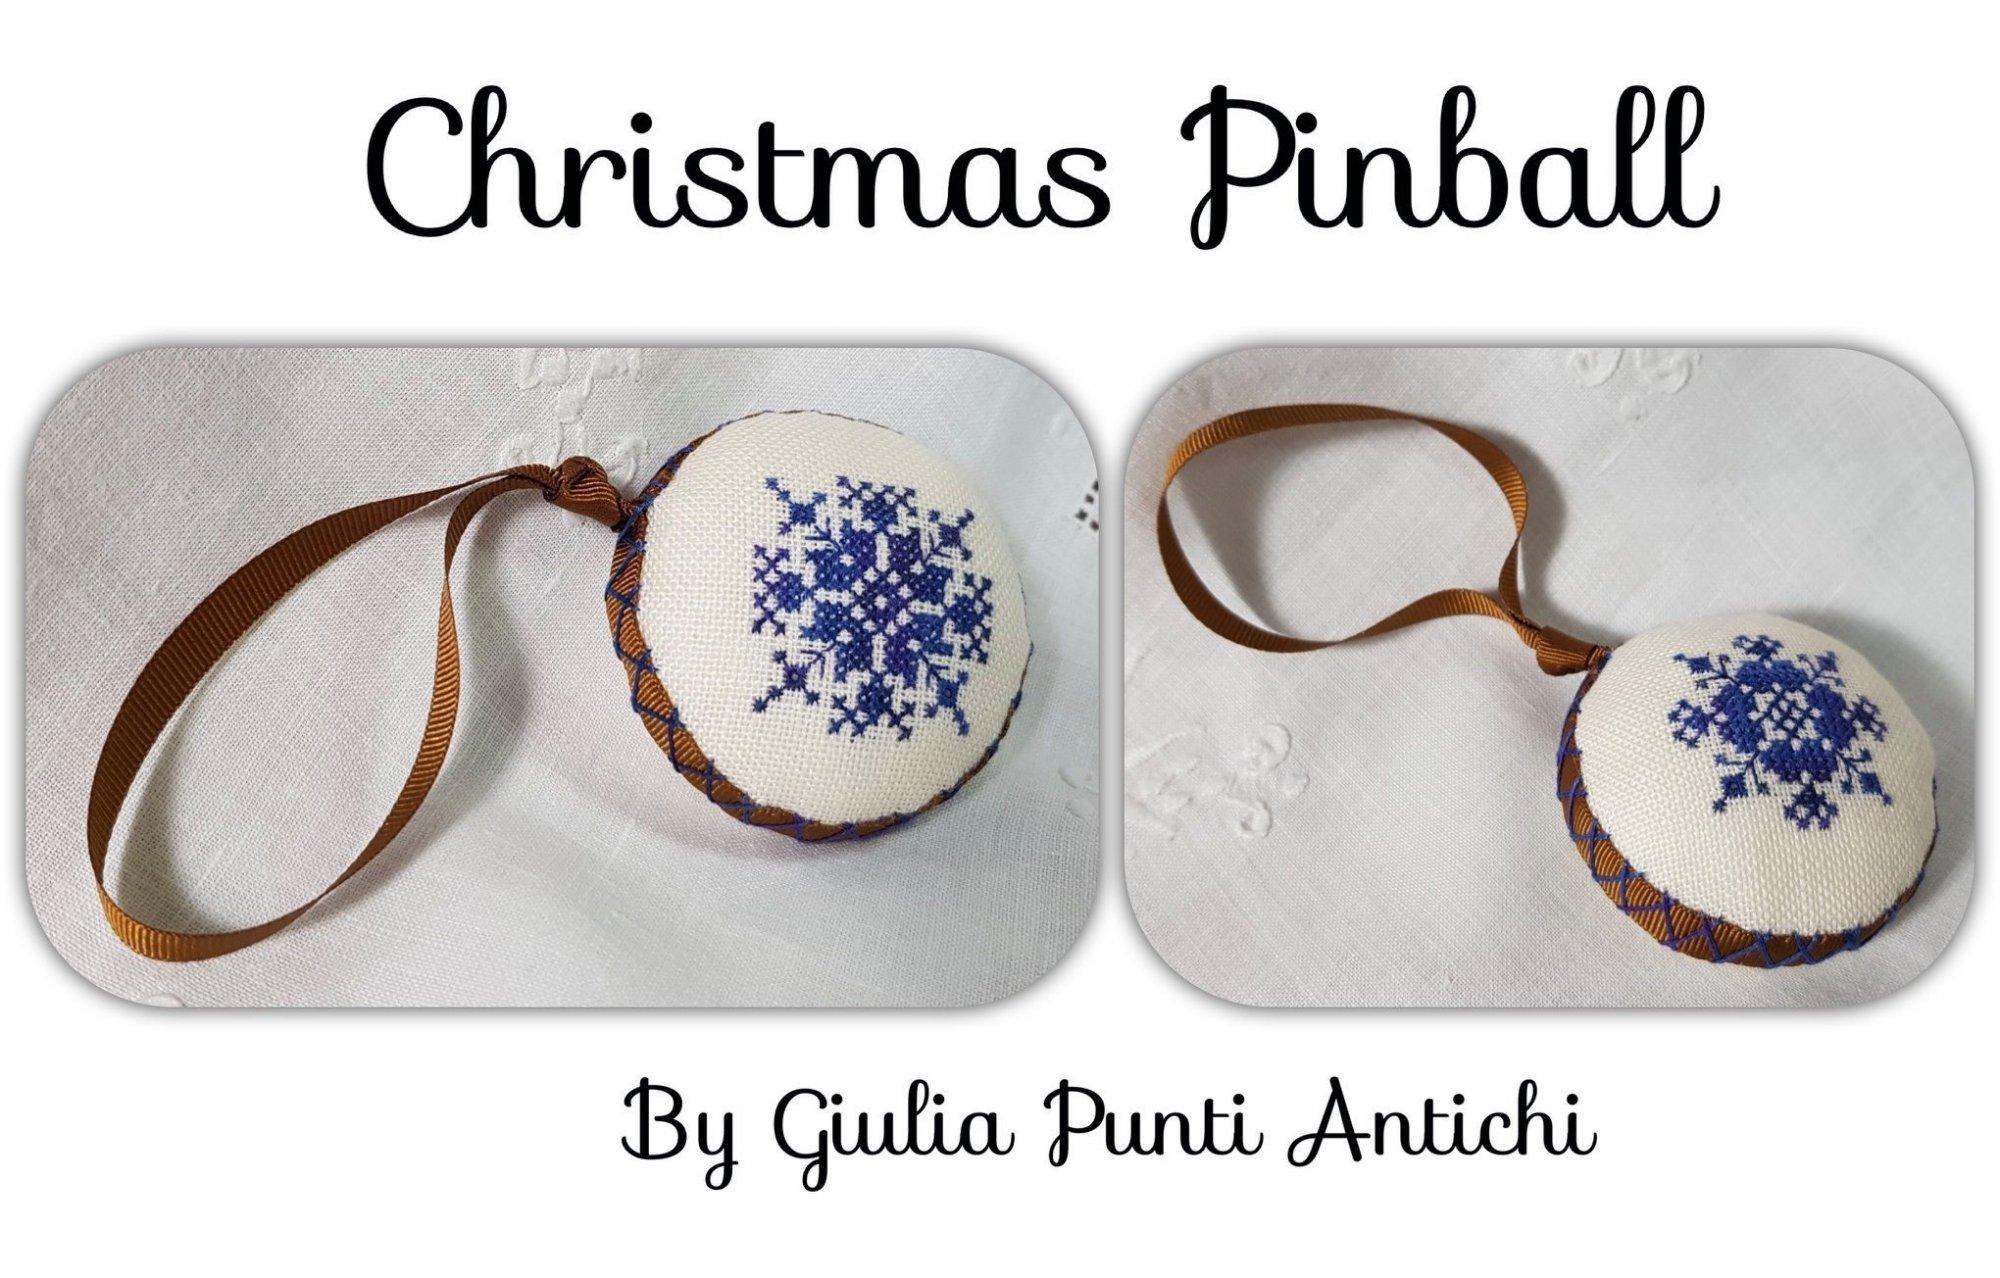 Guilia Punti Antichi Christmas Pinball